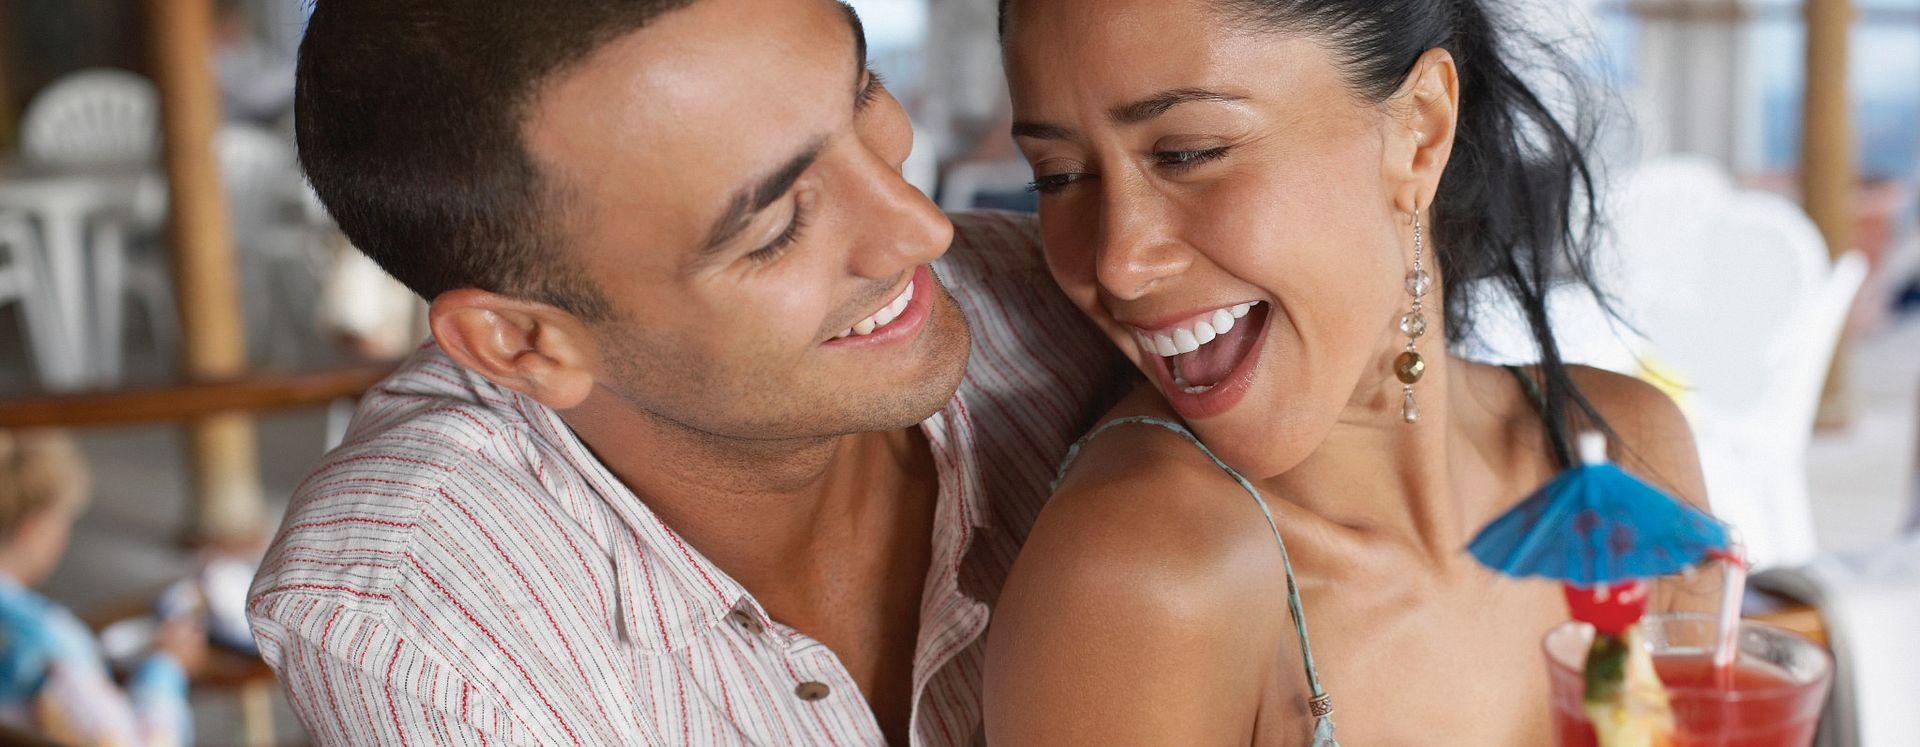 Casal adulto se divertindo em um bar